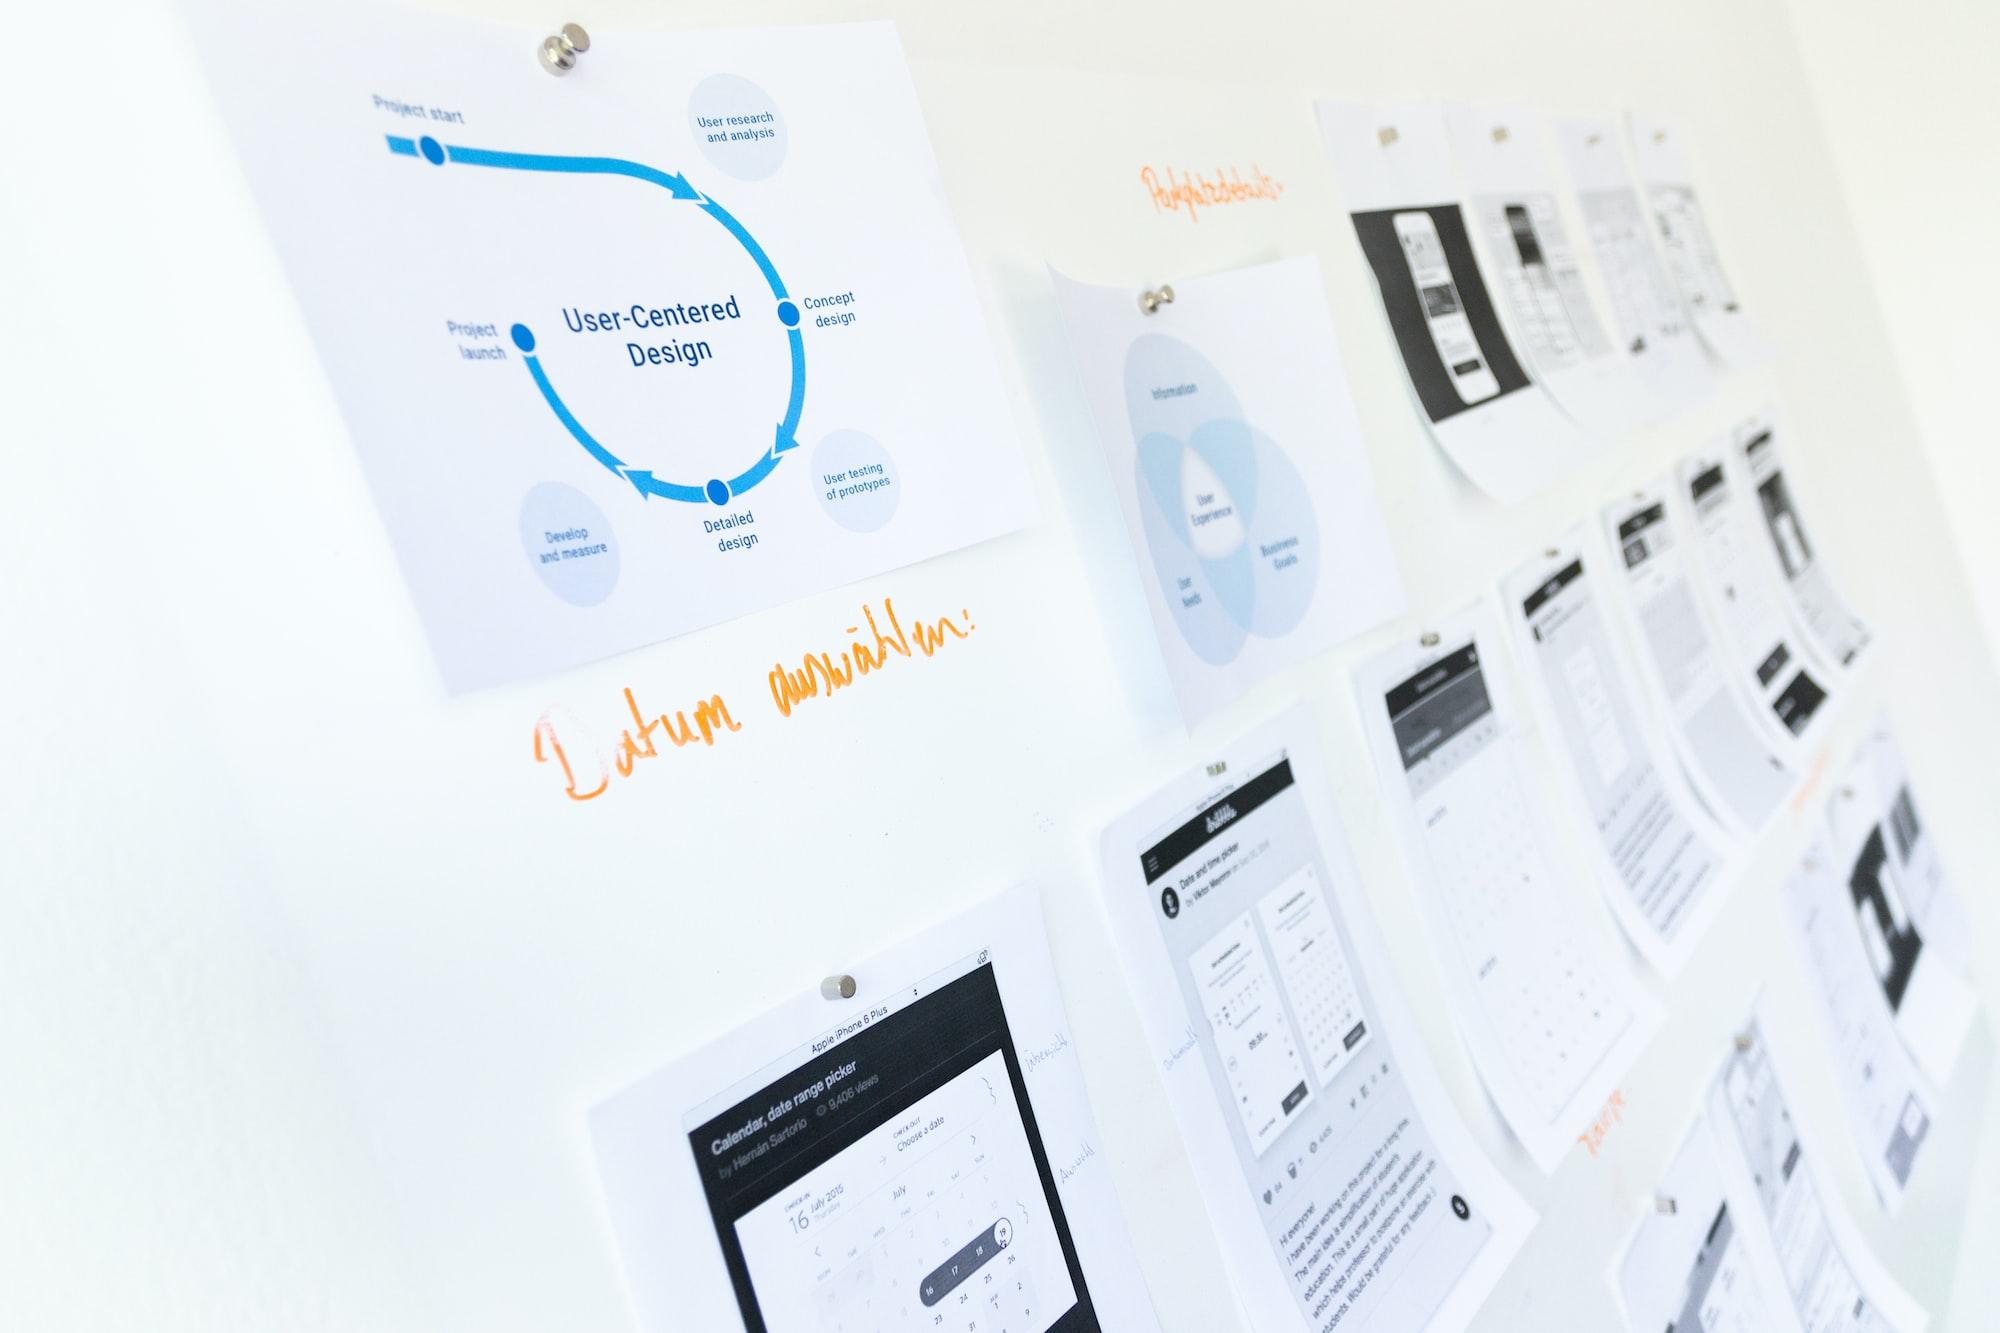 Design Inspiration on Whiteboard